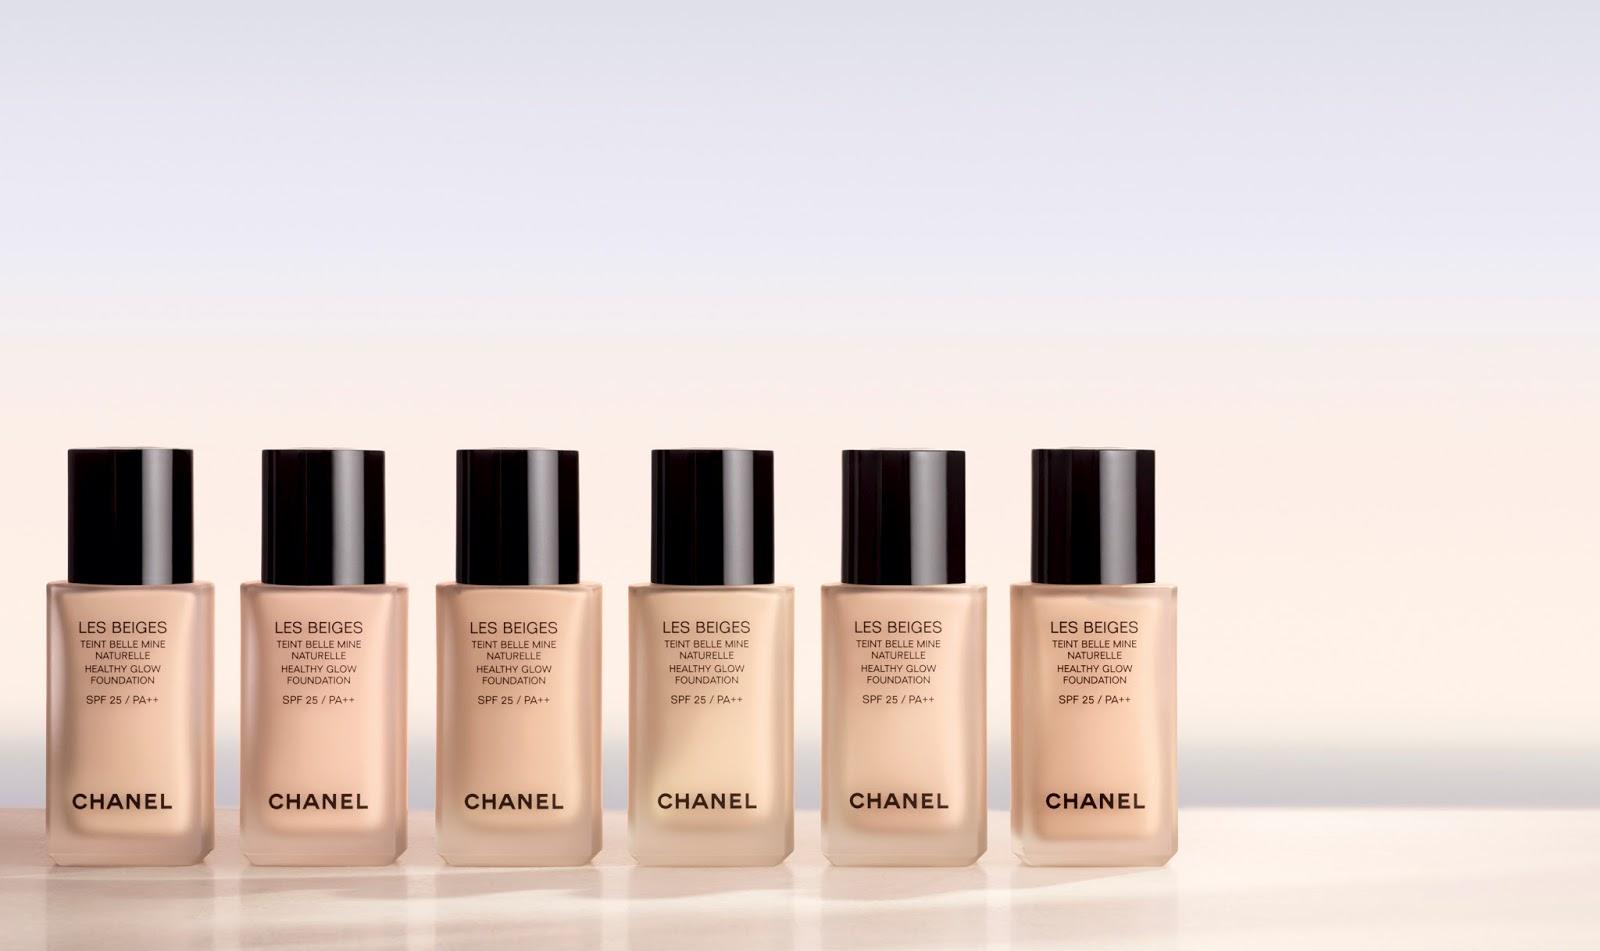 07a58569b4 Chanel Les Beiges Healthy Glow Foundation - Caroline Hirons